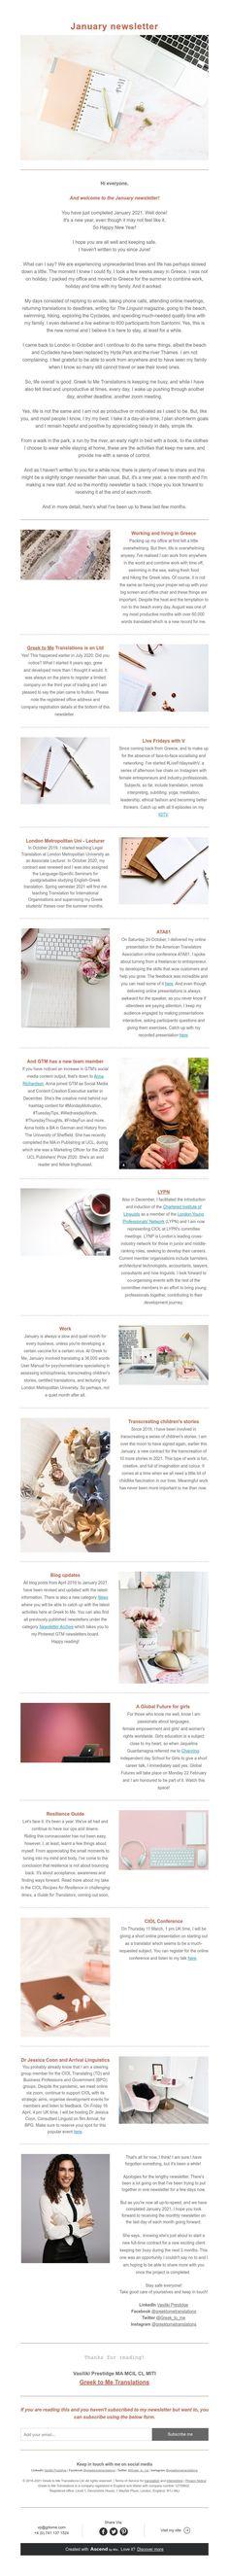 January newsletter London In October, January, Short Term Goals, Greek, News, Greece